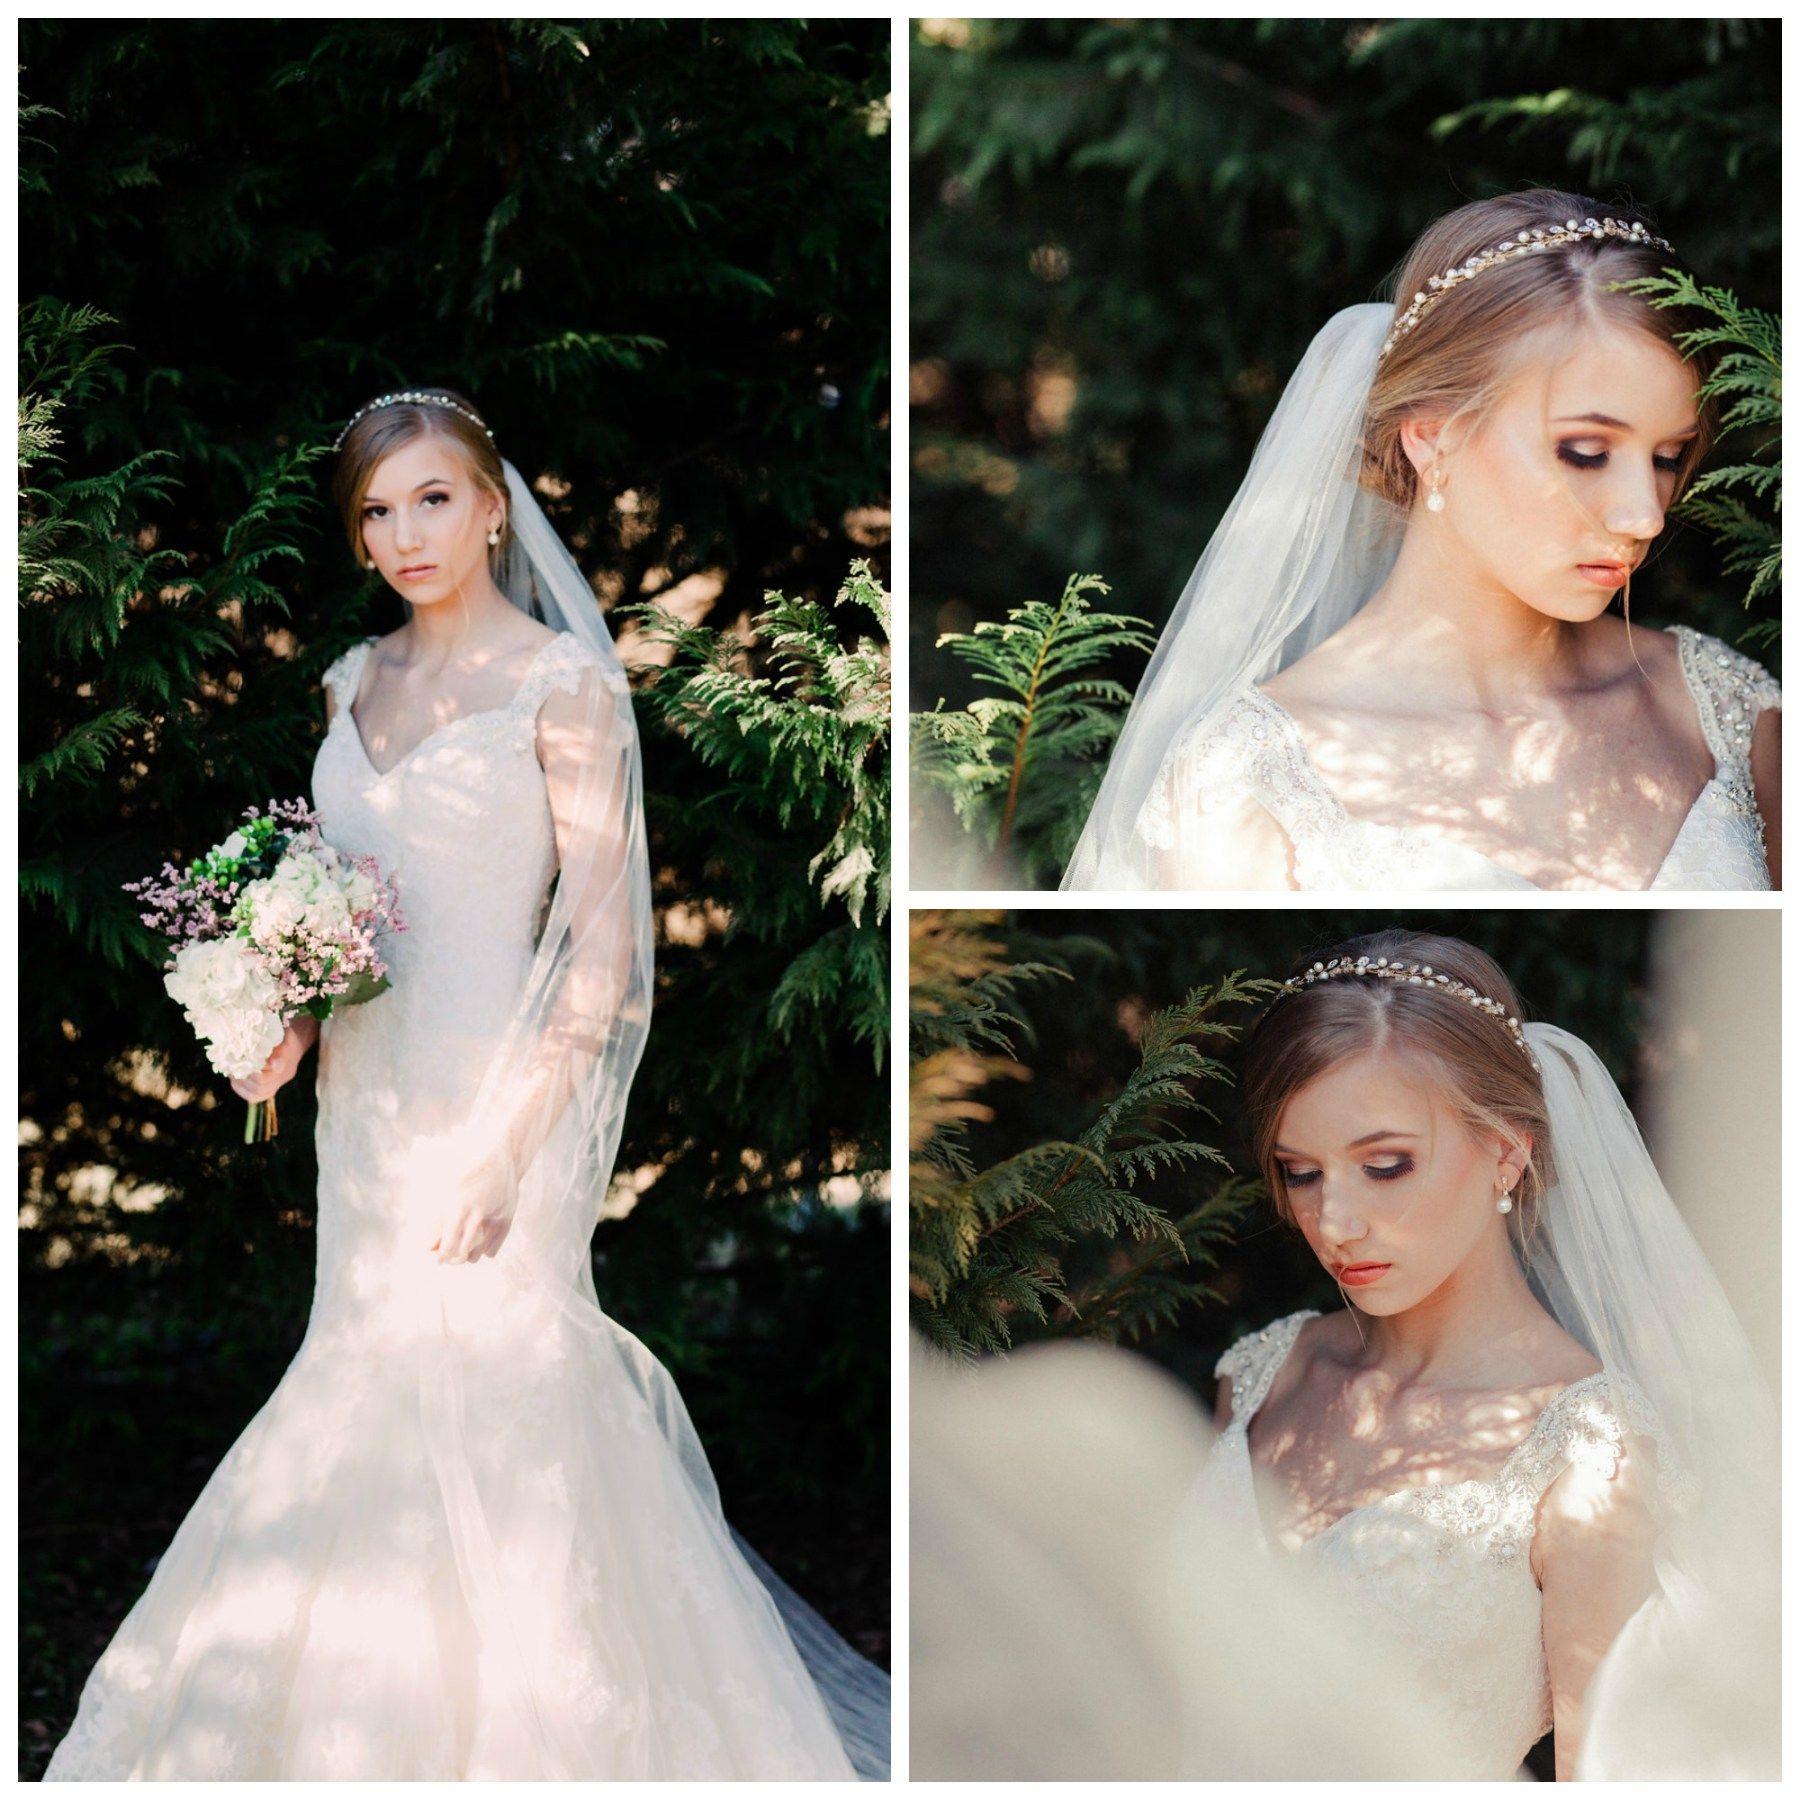 Burke And Pamela Married Melinda Sheree Photography Knoxville Wedding Photographer Knoxville Wedding Photographer Knoxville Wedding Blogger Wedding